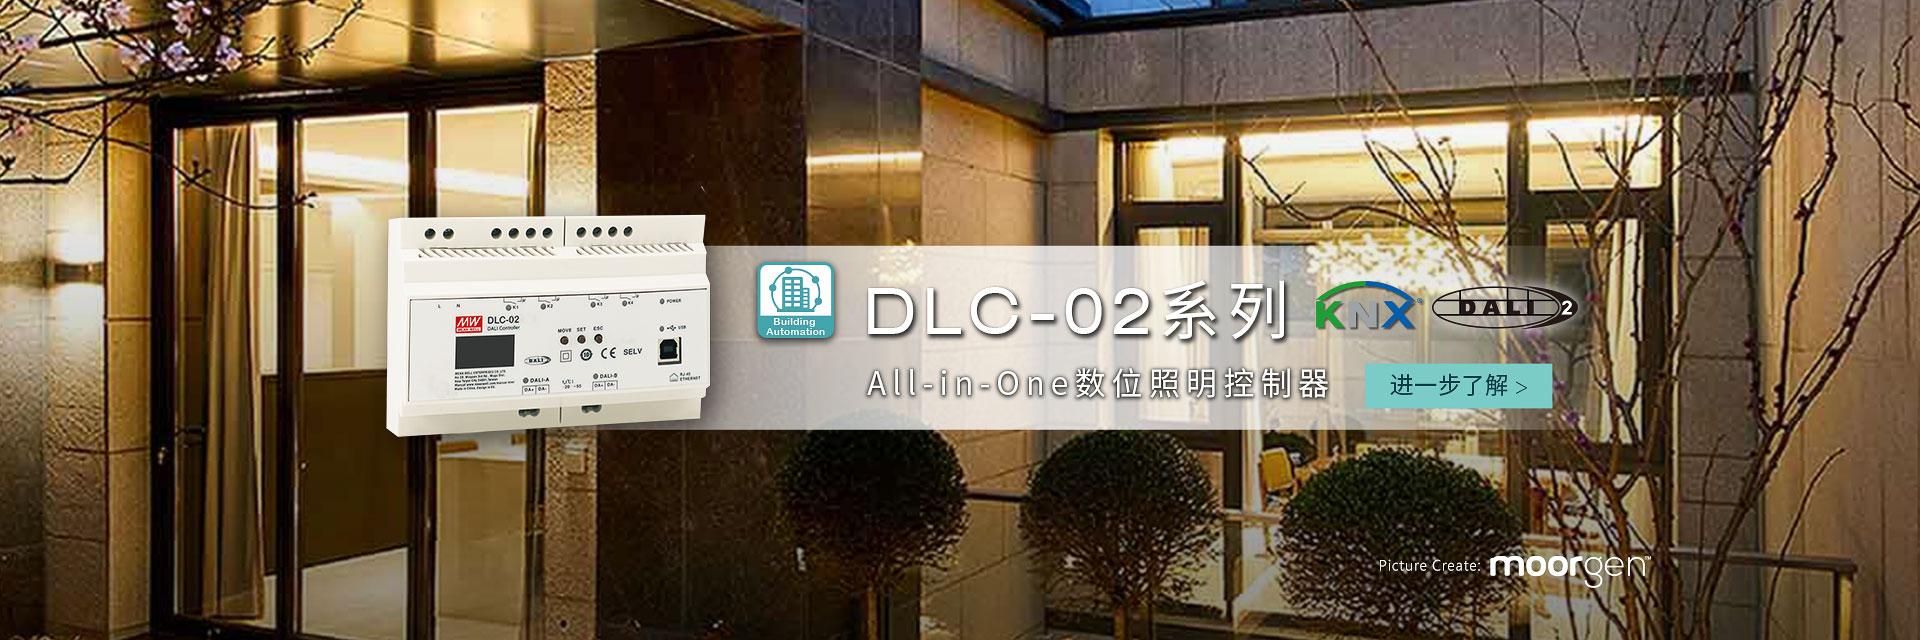 DLC-02-CN